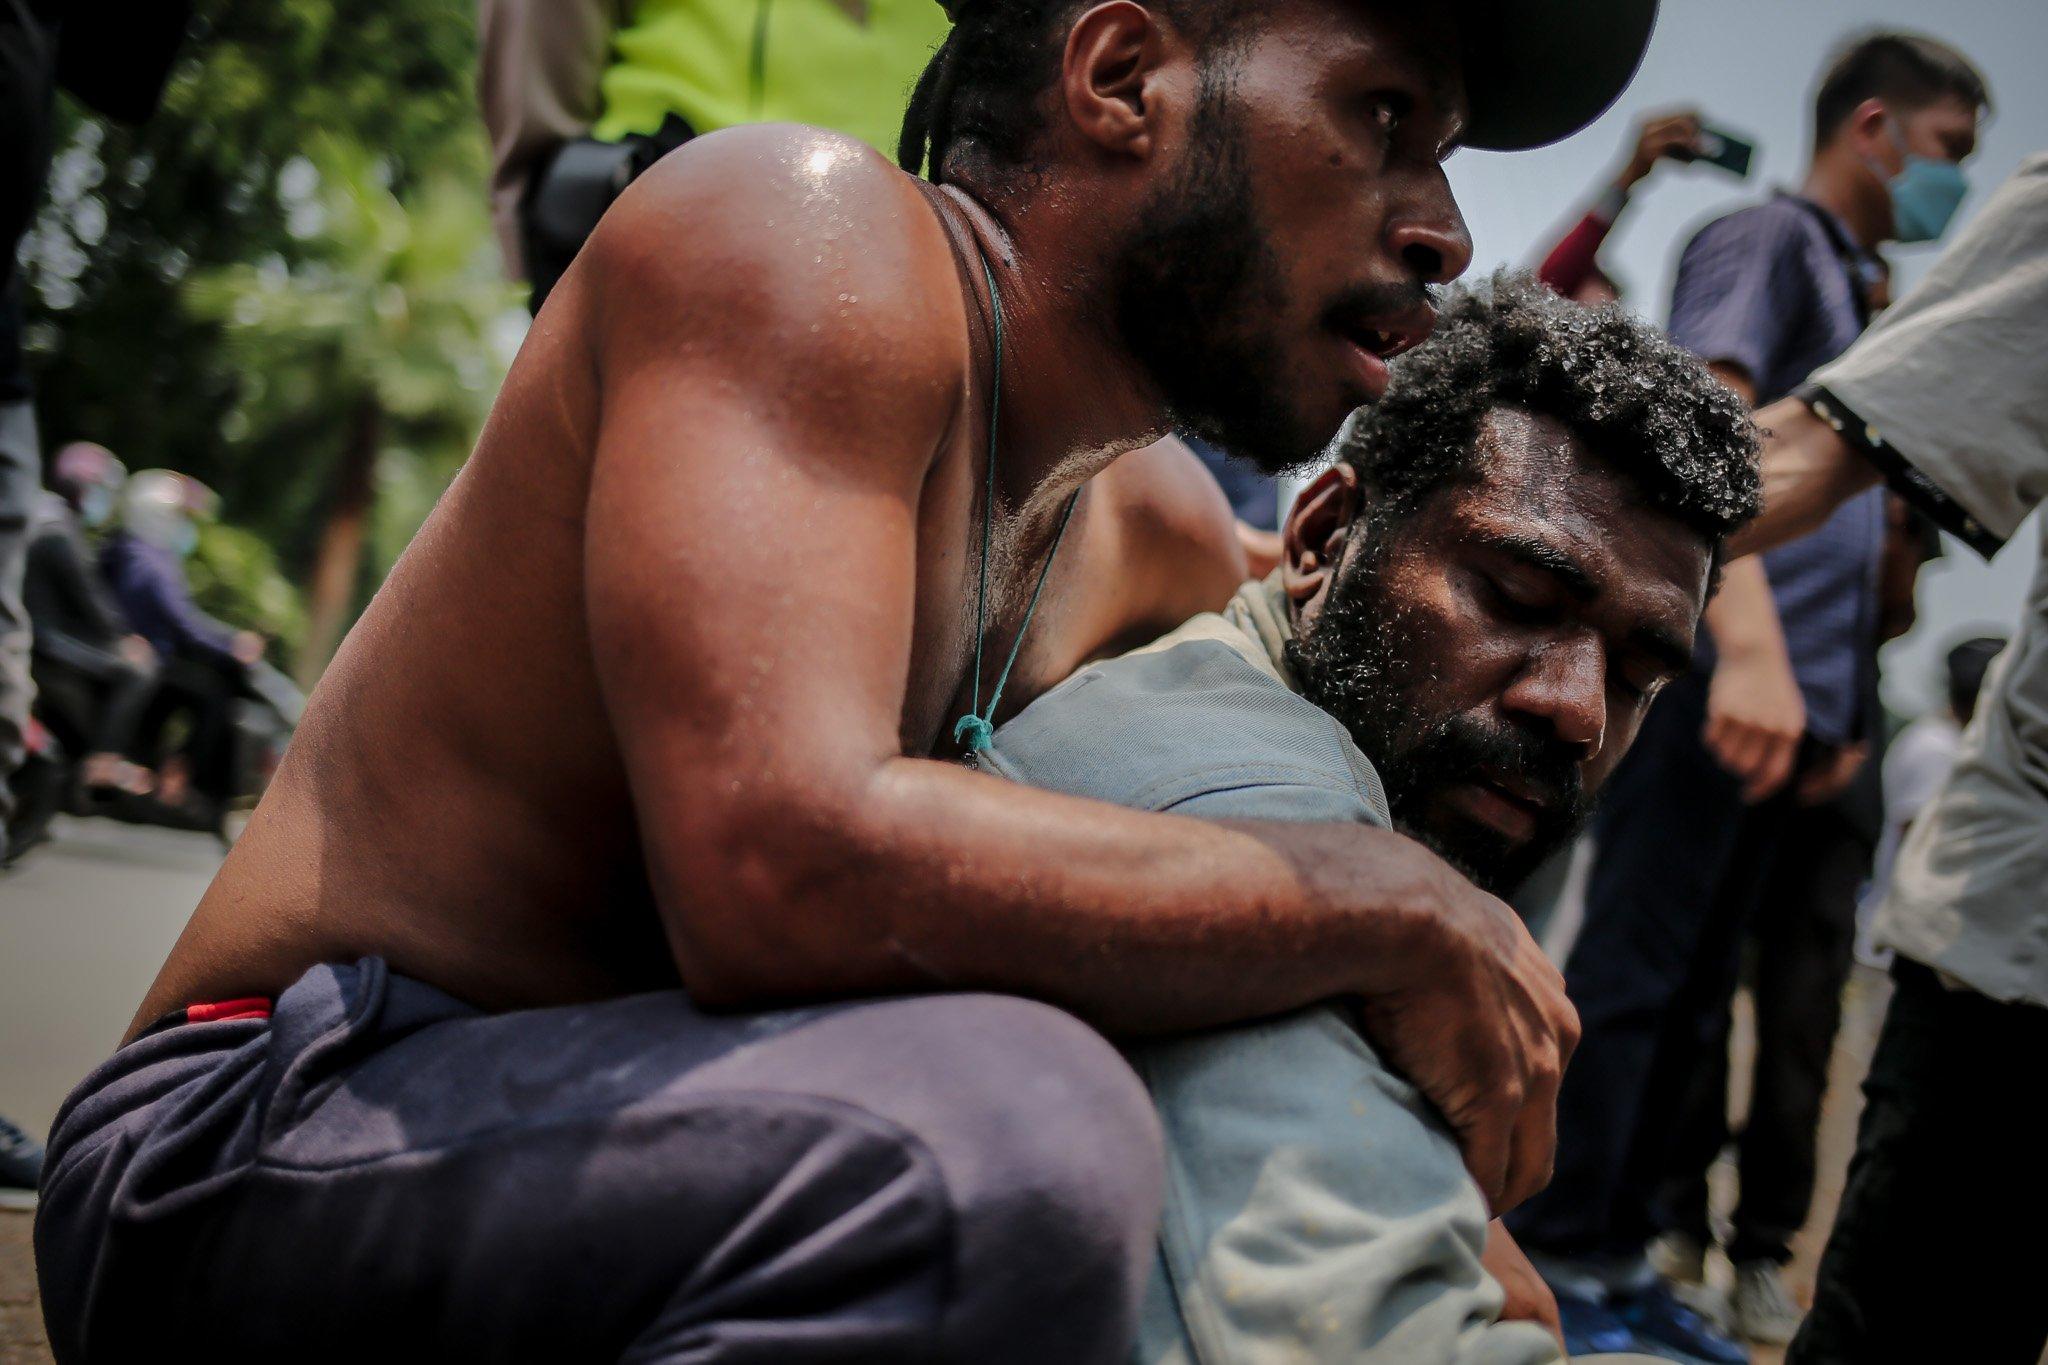 Sejumlah pengunjuk rasa yang tergabung dalam Aliansi Mahasiswa Papua (AMP) memeluk erat rekannya saat diamankan pihak kepolisian dalam aksi unjuk rasa peringatan Roma Agreement ke-59 di Depan Kedutaan Amerika Serikat, Jakarta, Kamis, (30/9/2021). Sebanyak 17 mahasiswa diamankan karena diduga tidak taat protokol kesehatan dan menimbulkan kerumuan di tengah penyebaran Covid-19.